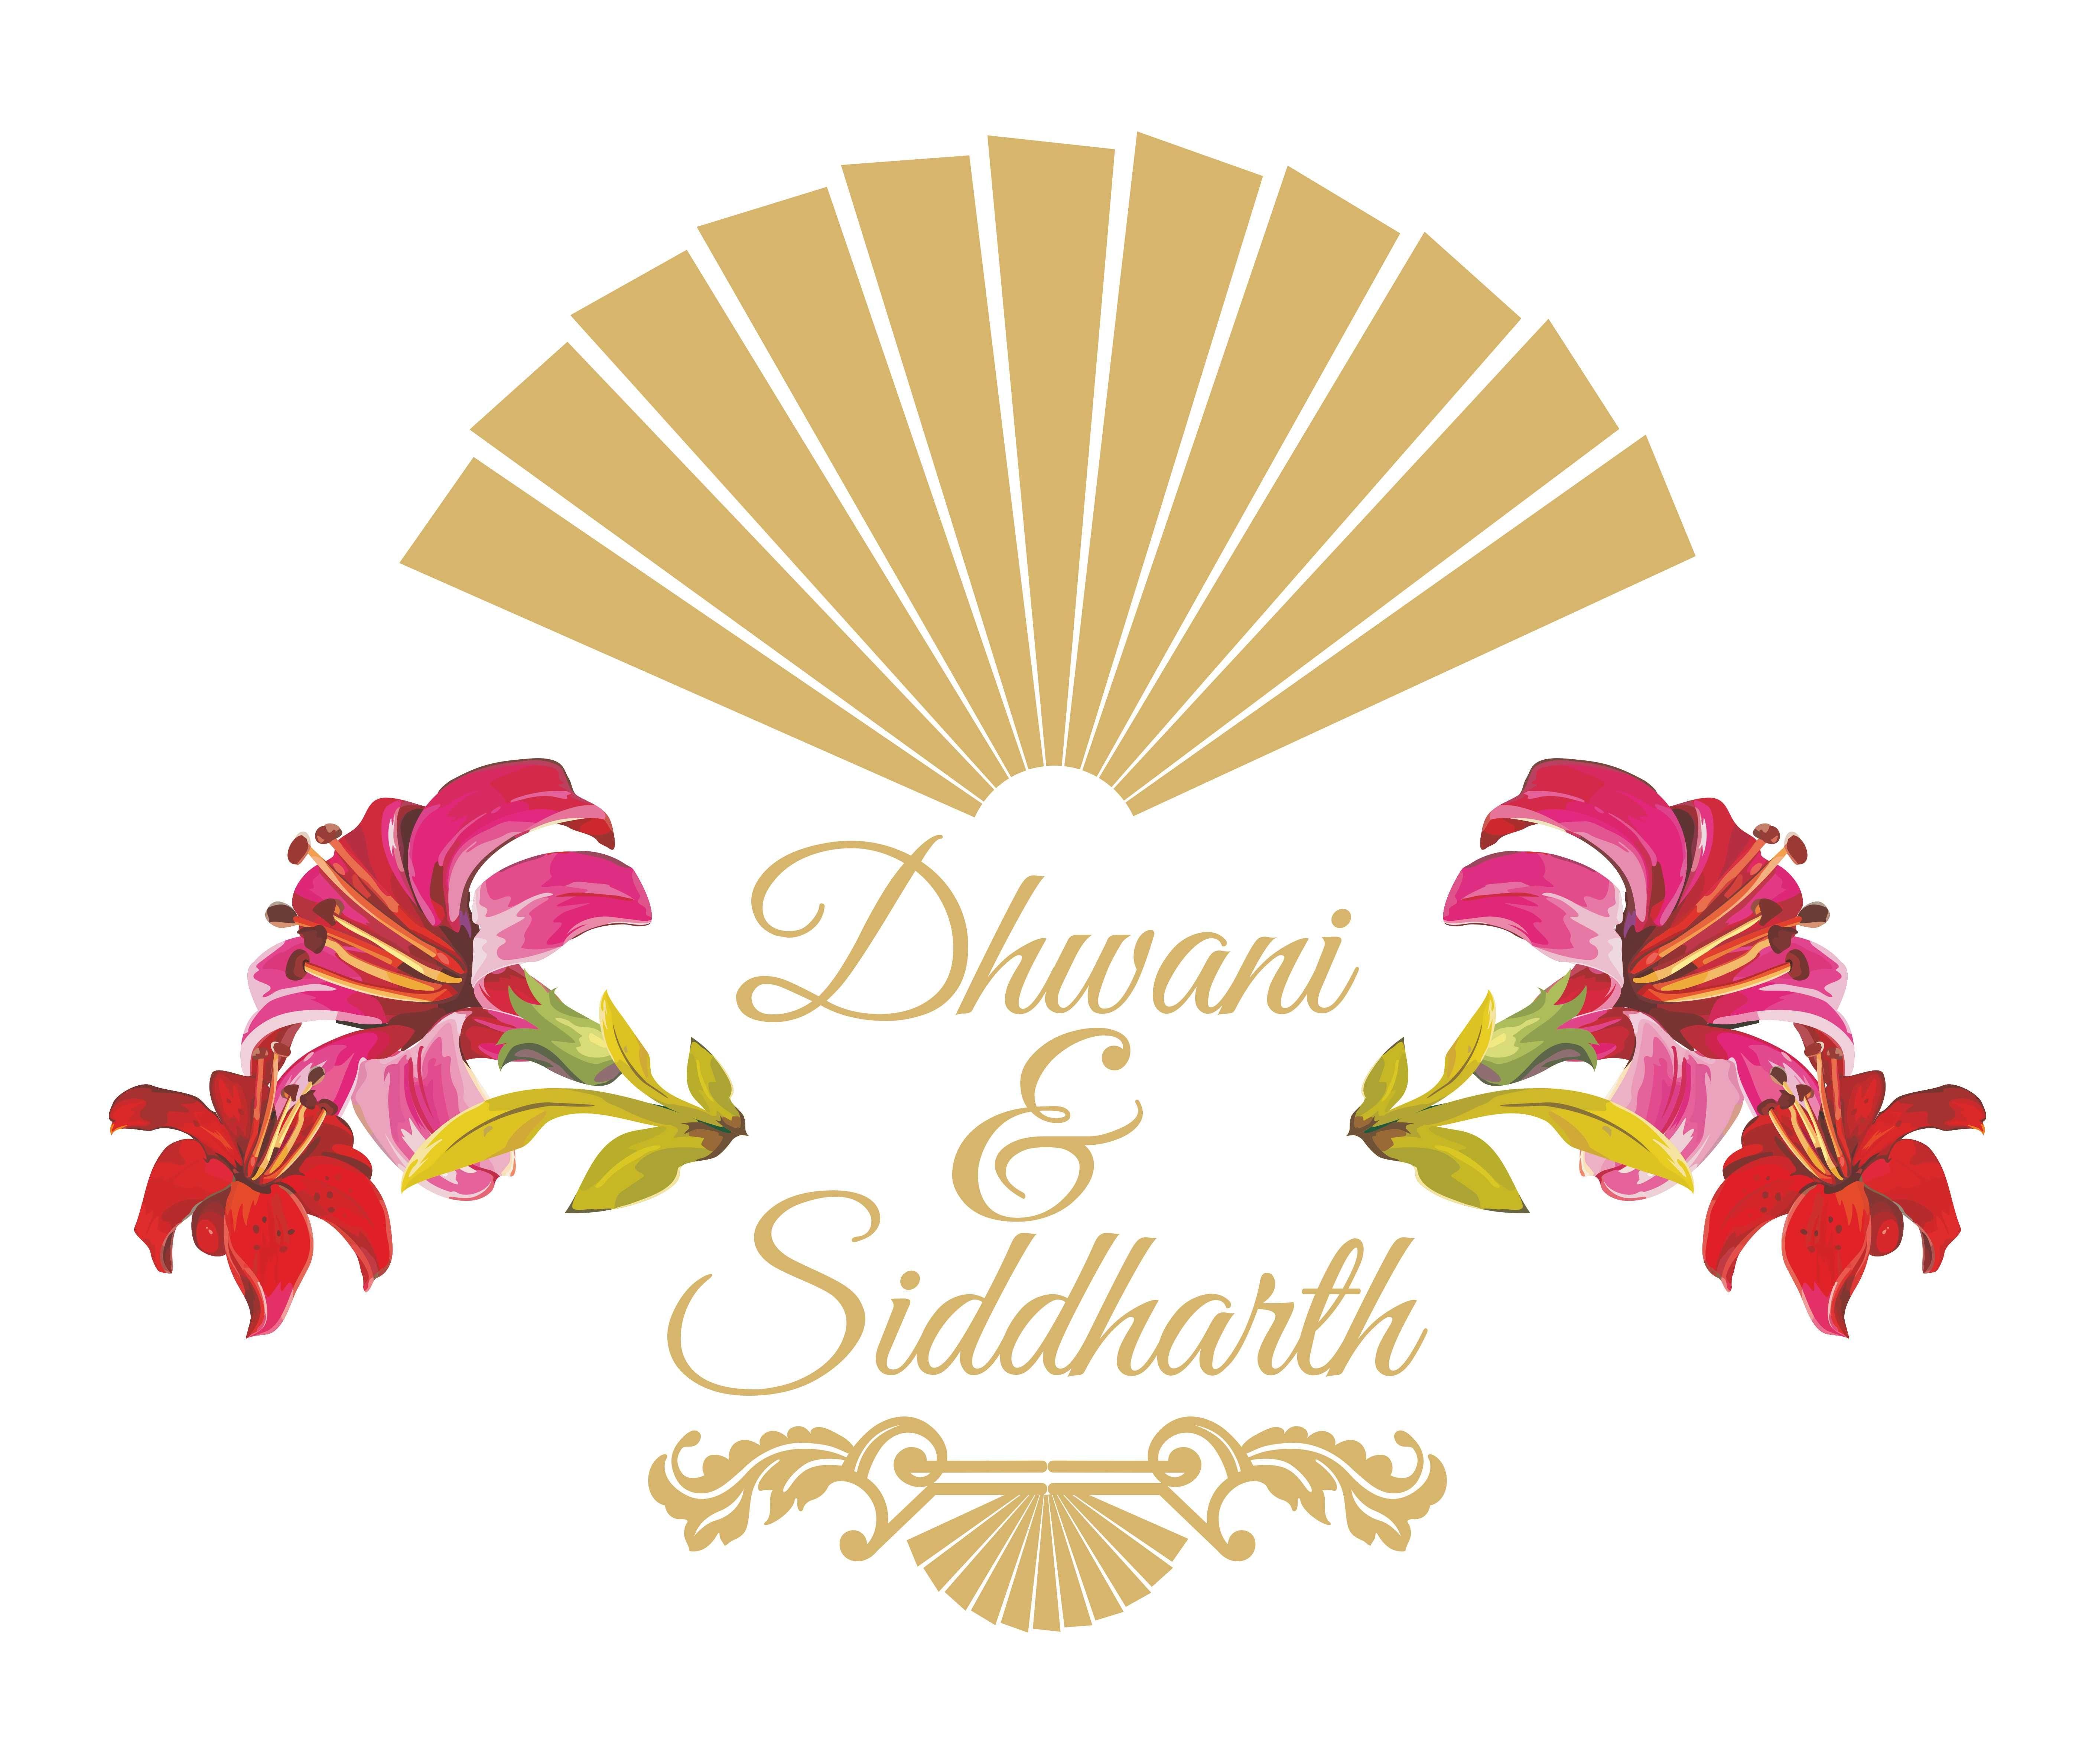 Wedding Logo Wedding Invitations Cards Indian Wedding Cards